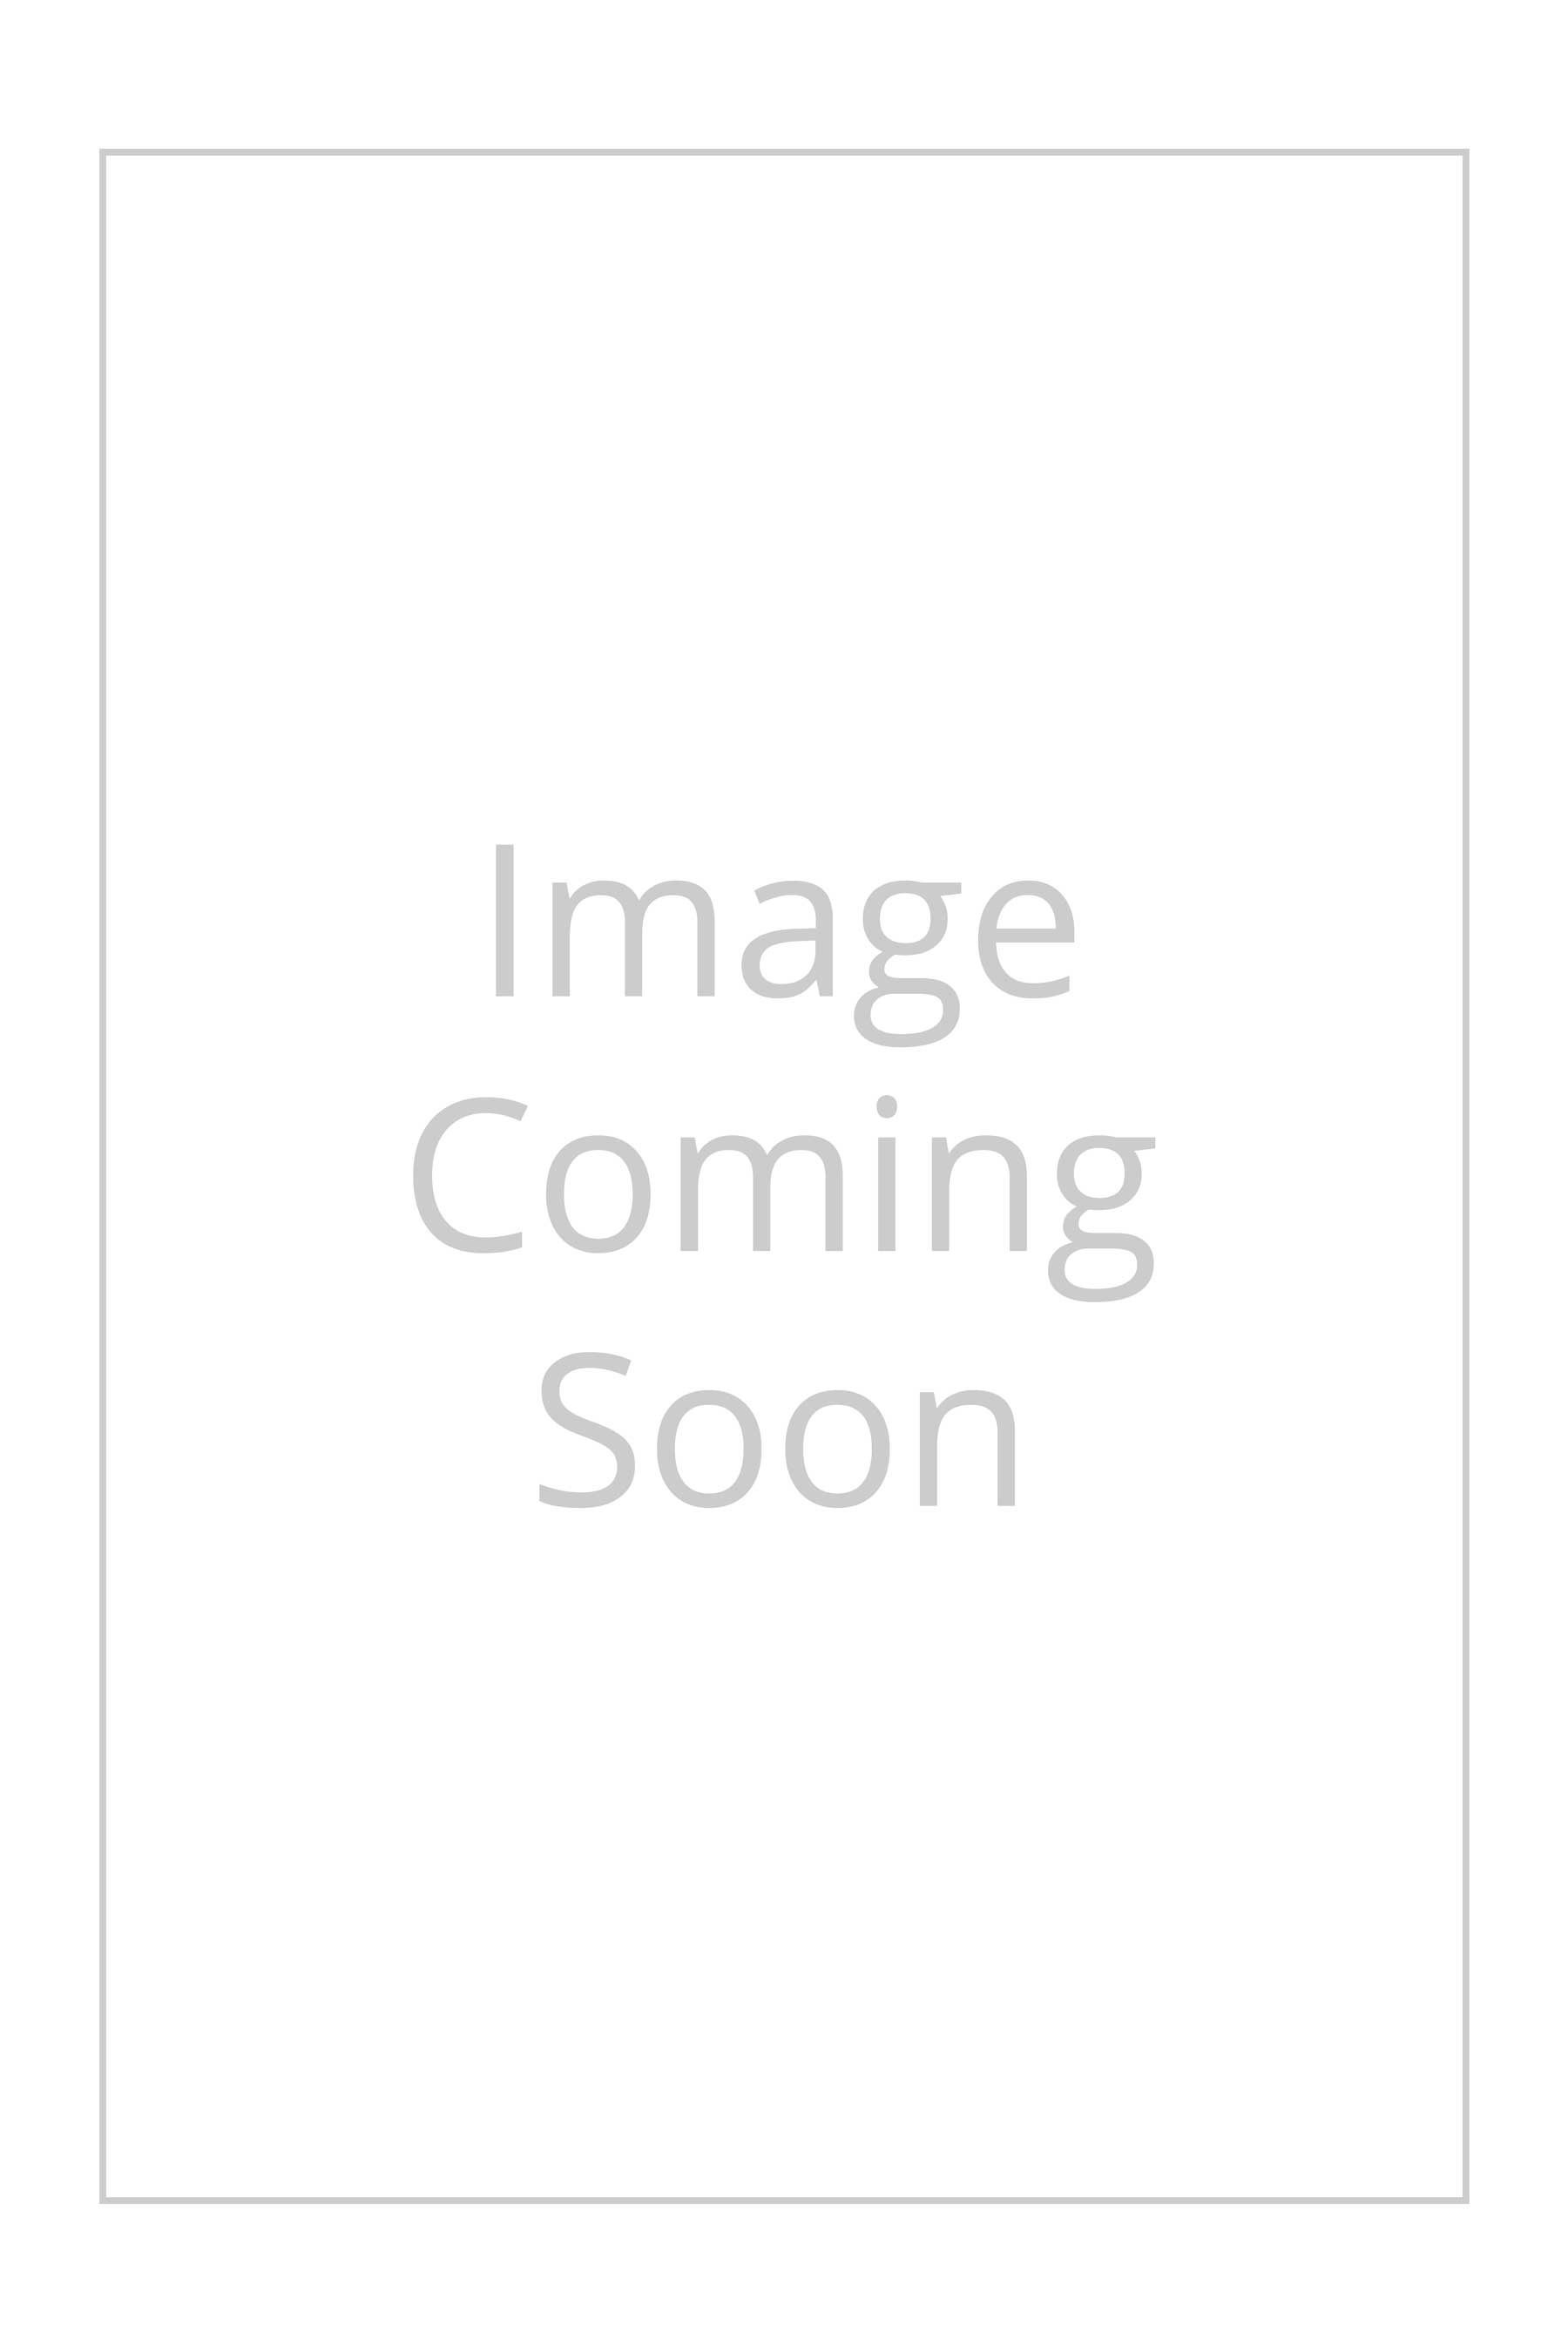 St. John Long Black Santana Knit Evening Dress with Paillettes